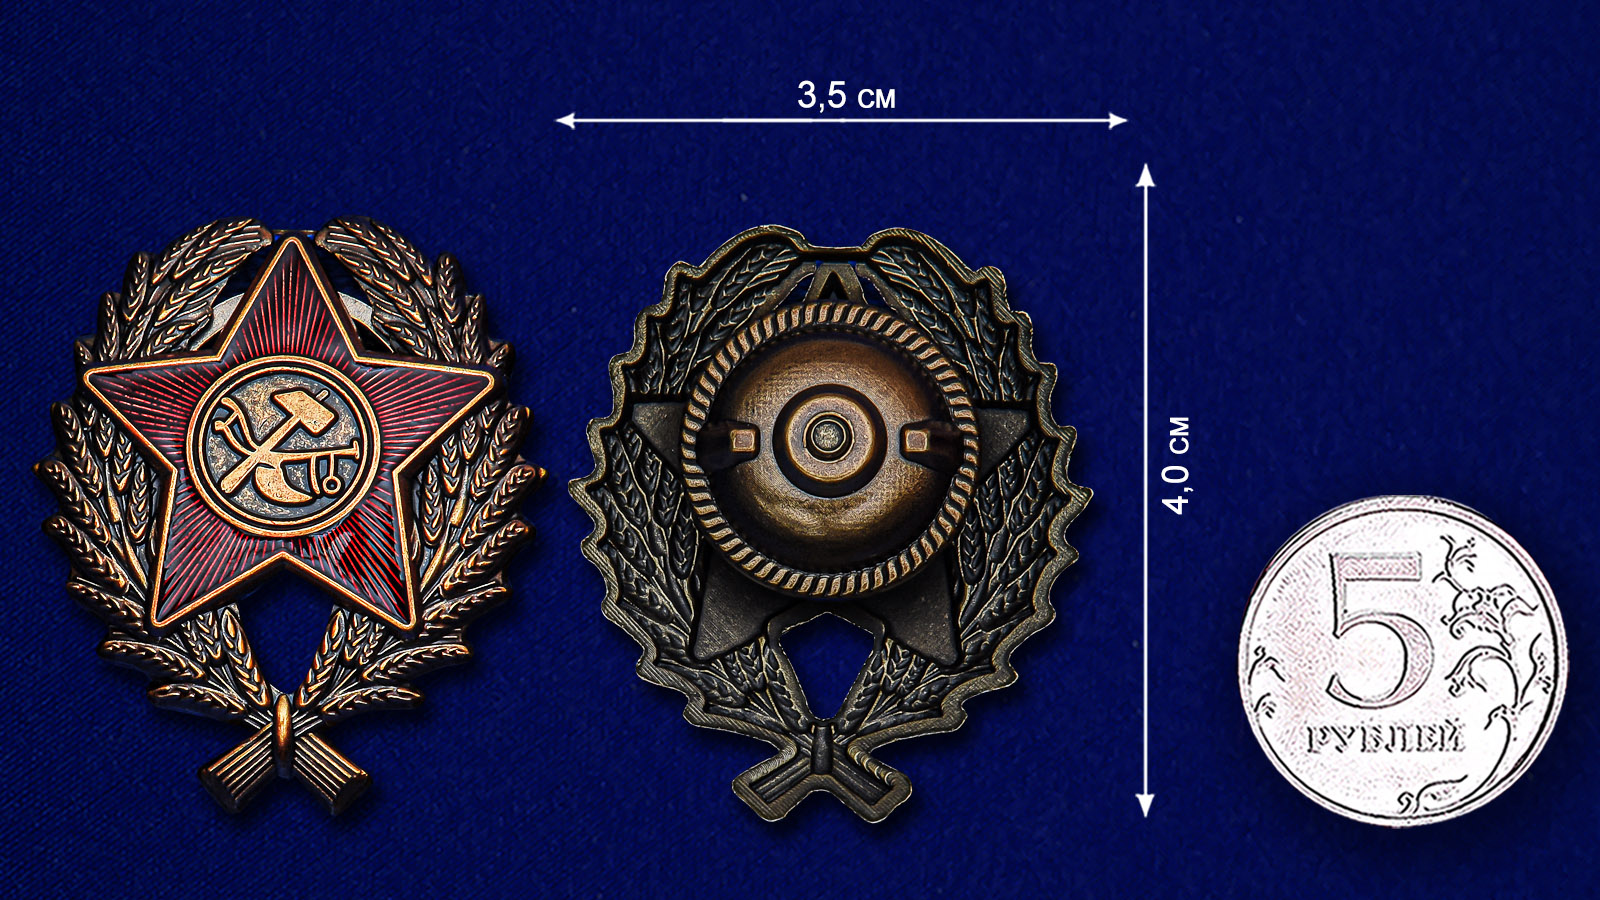 Знак Красного командира (1918-1922 гг.) - размер